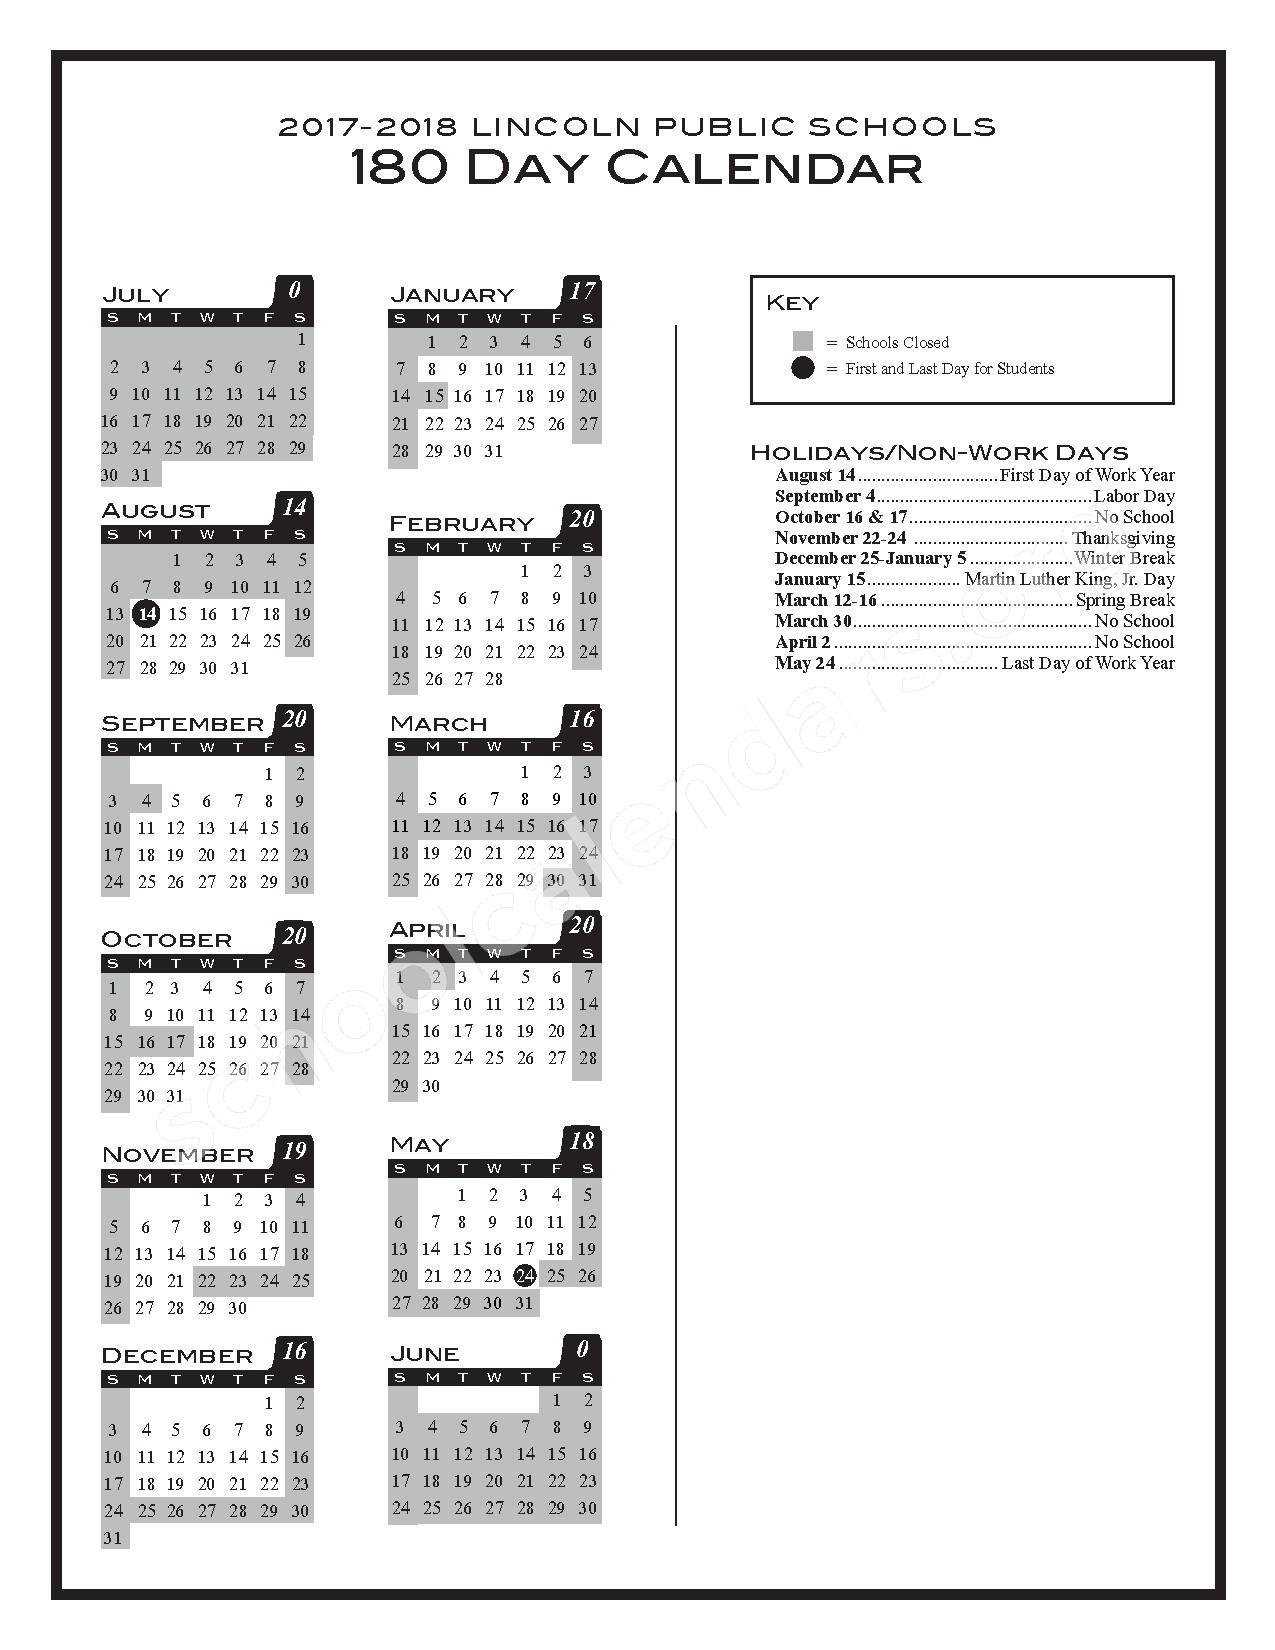 2017 - 2018 180-day Calendar – Lincoln Public Schools – page 1